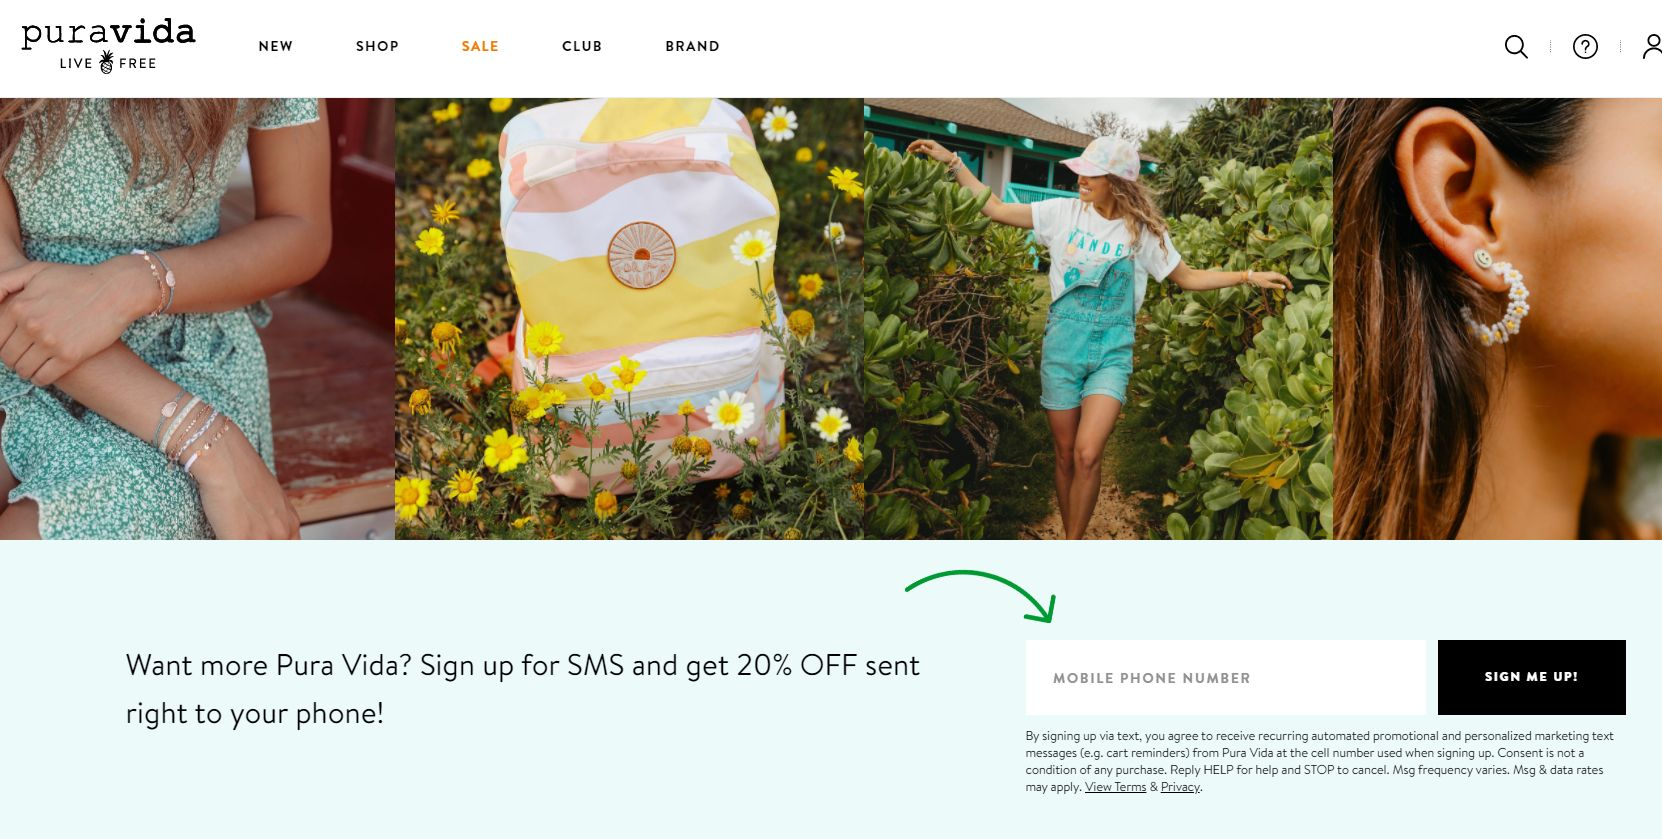 SMS subscription form on Pura Vida Bracelets website